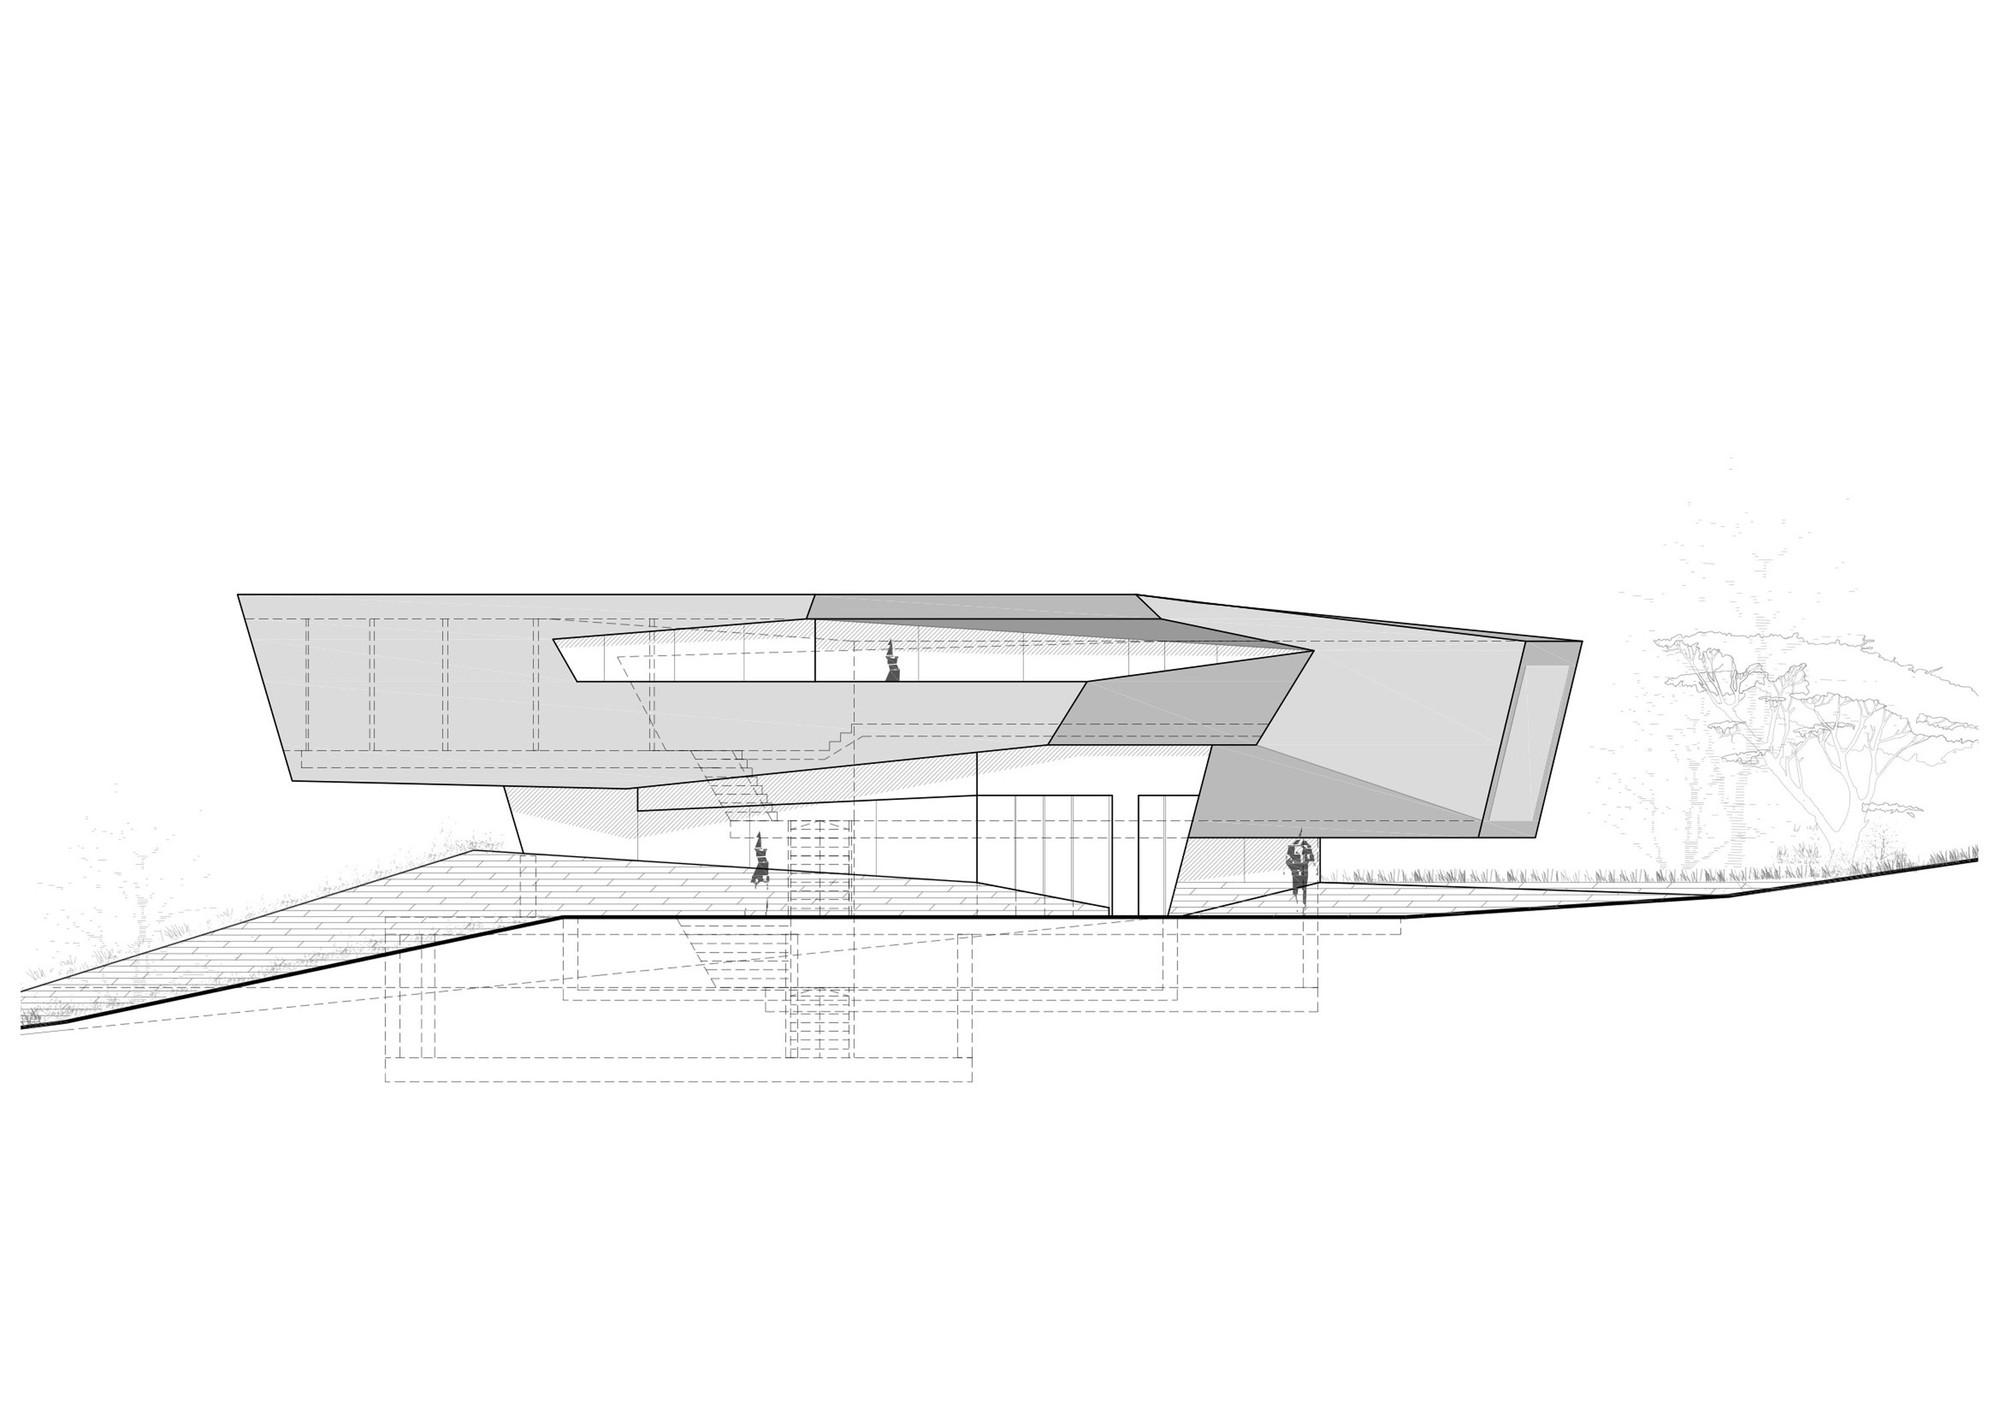 Galer a de villa freundorf project a01 31 for Family home plans com